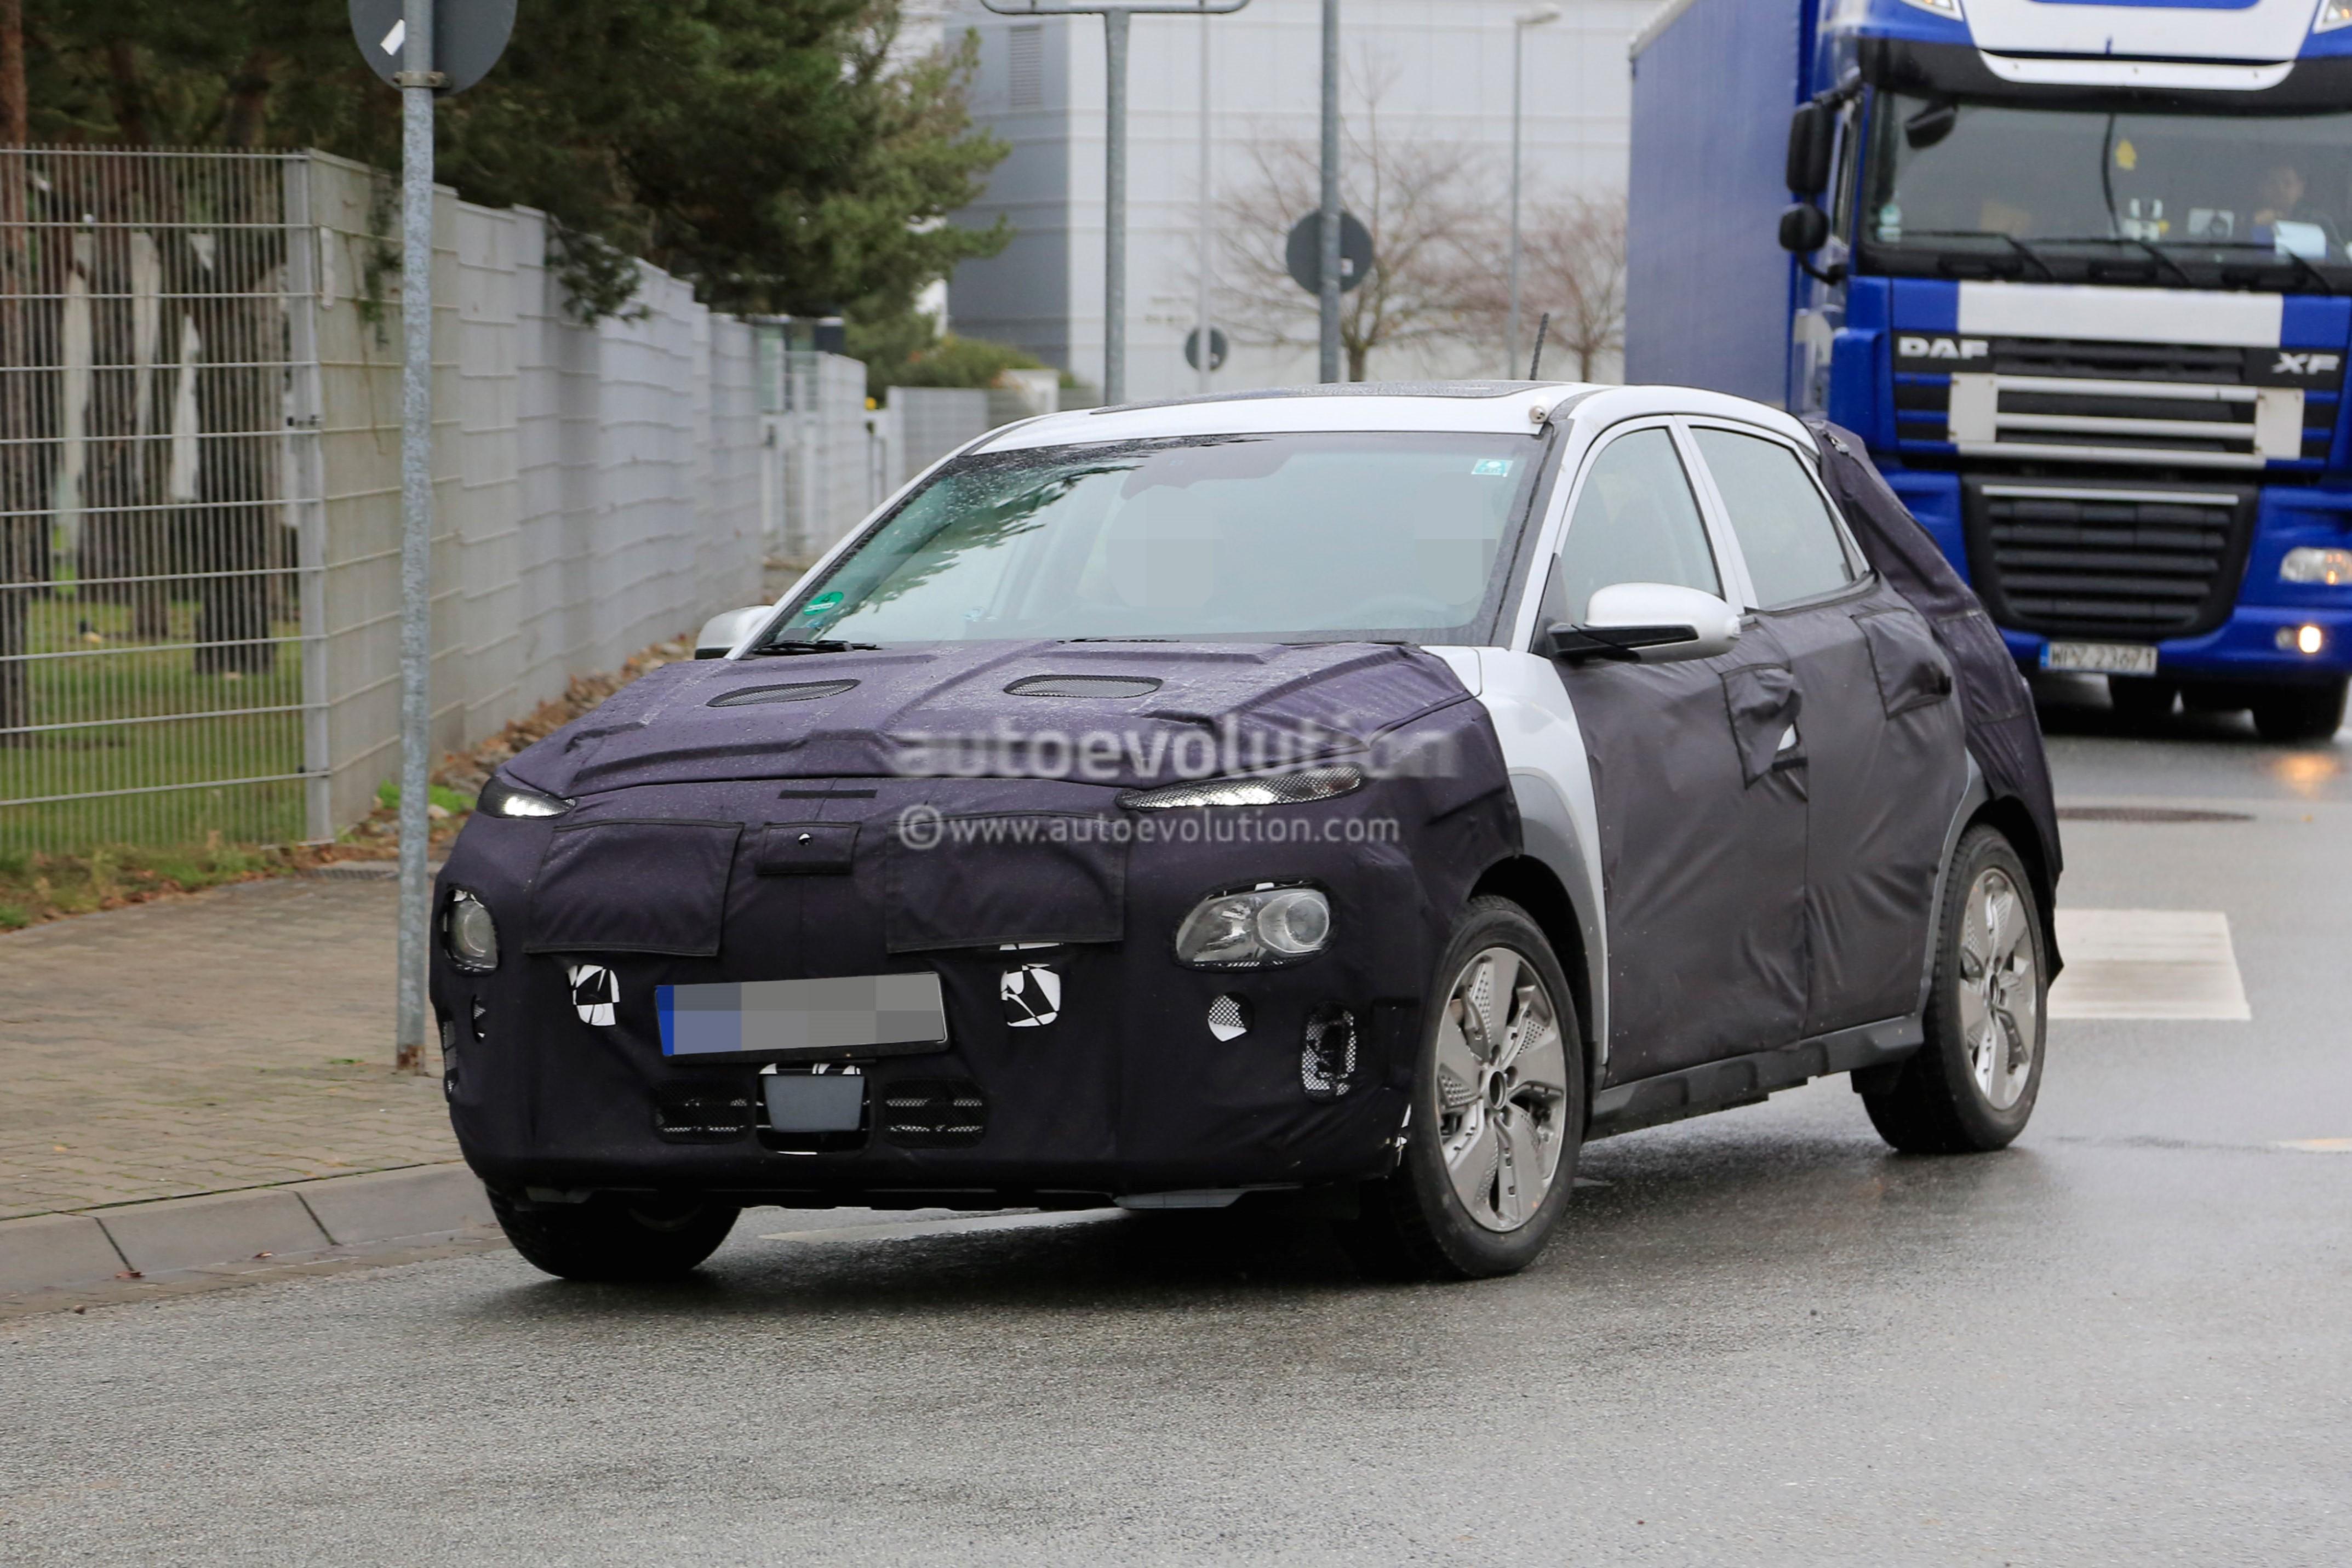 Hyundai Spy Shots >> Spyshots: 2018 Hyundai Kona Electric SUV Caught Testing In Germany - autoevolution